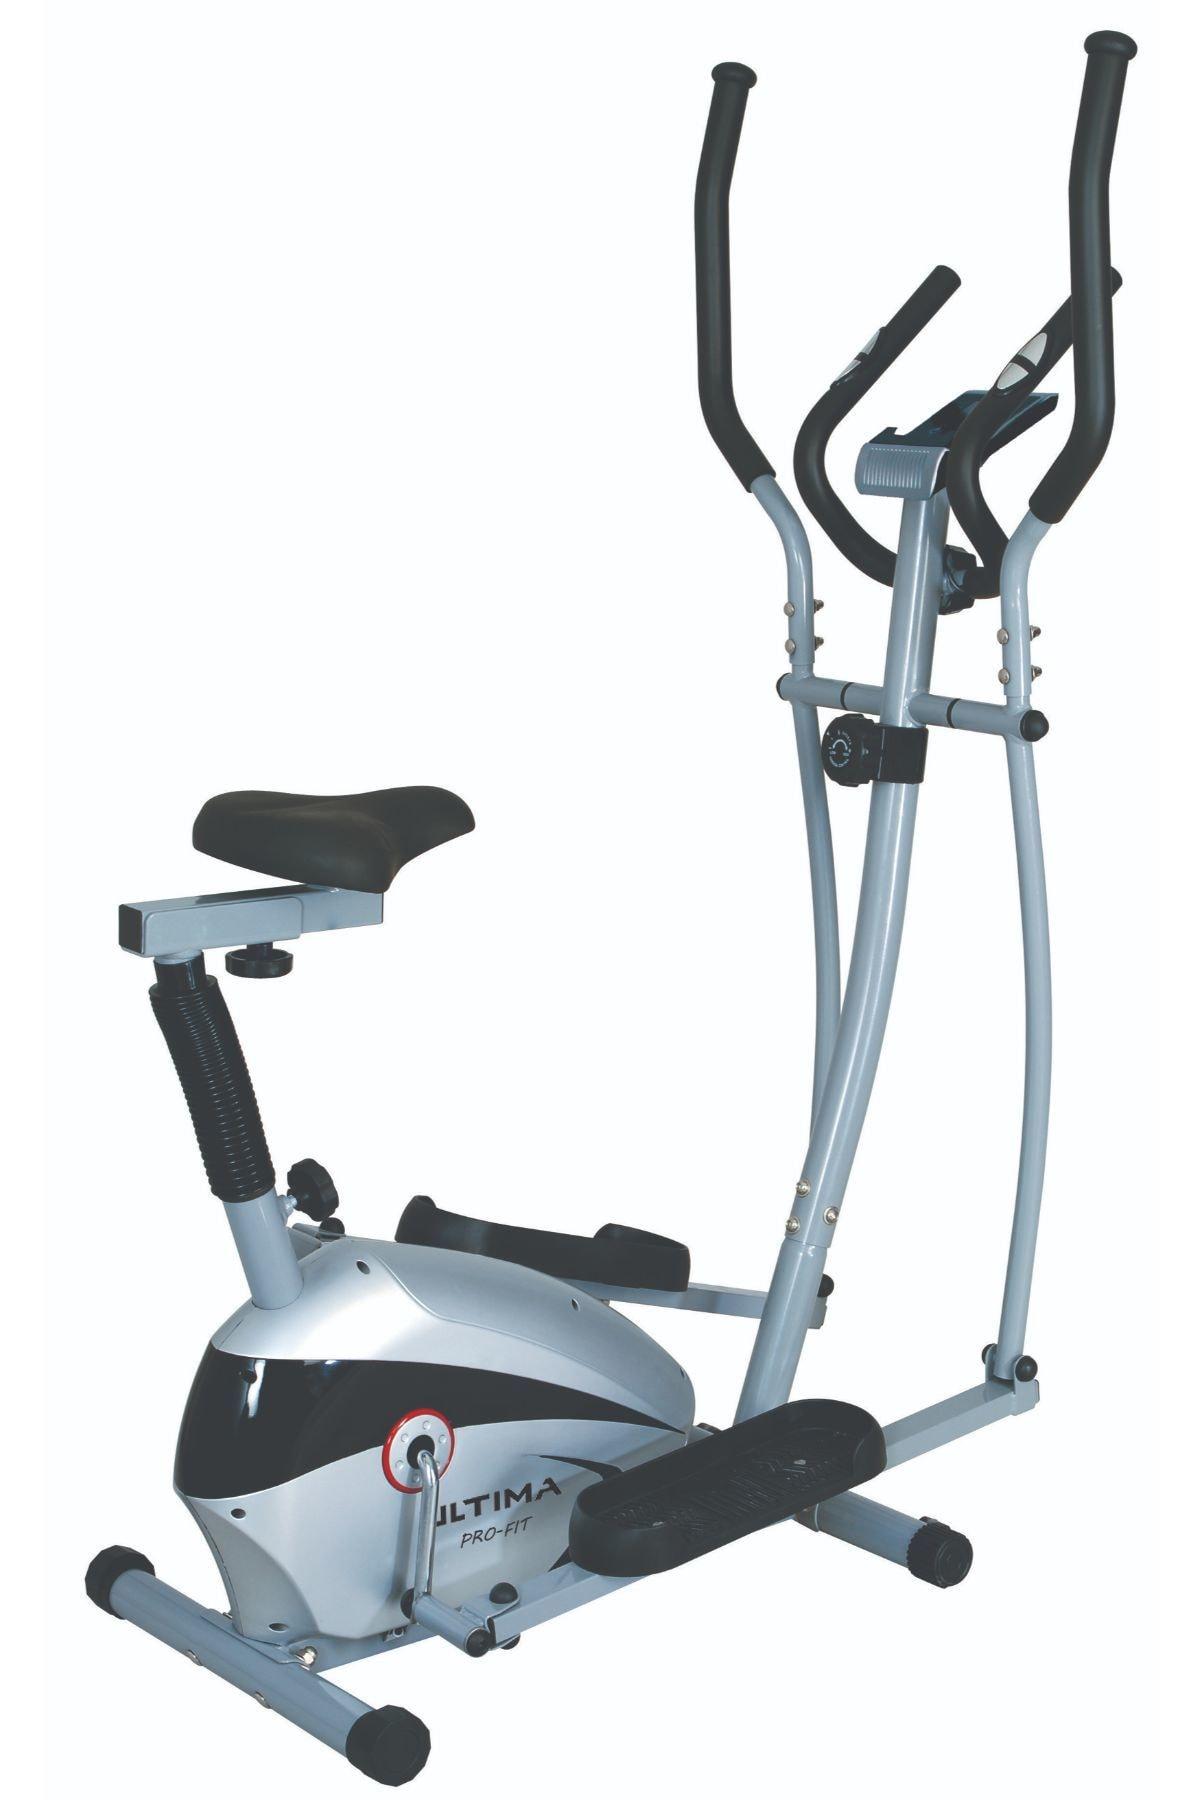 Pro-Fit Manyetik Eliptik Kondisyon Bisikleti